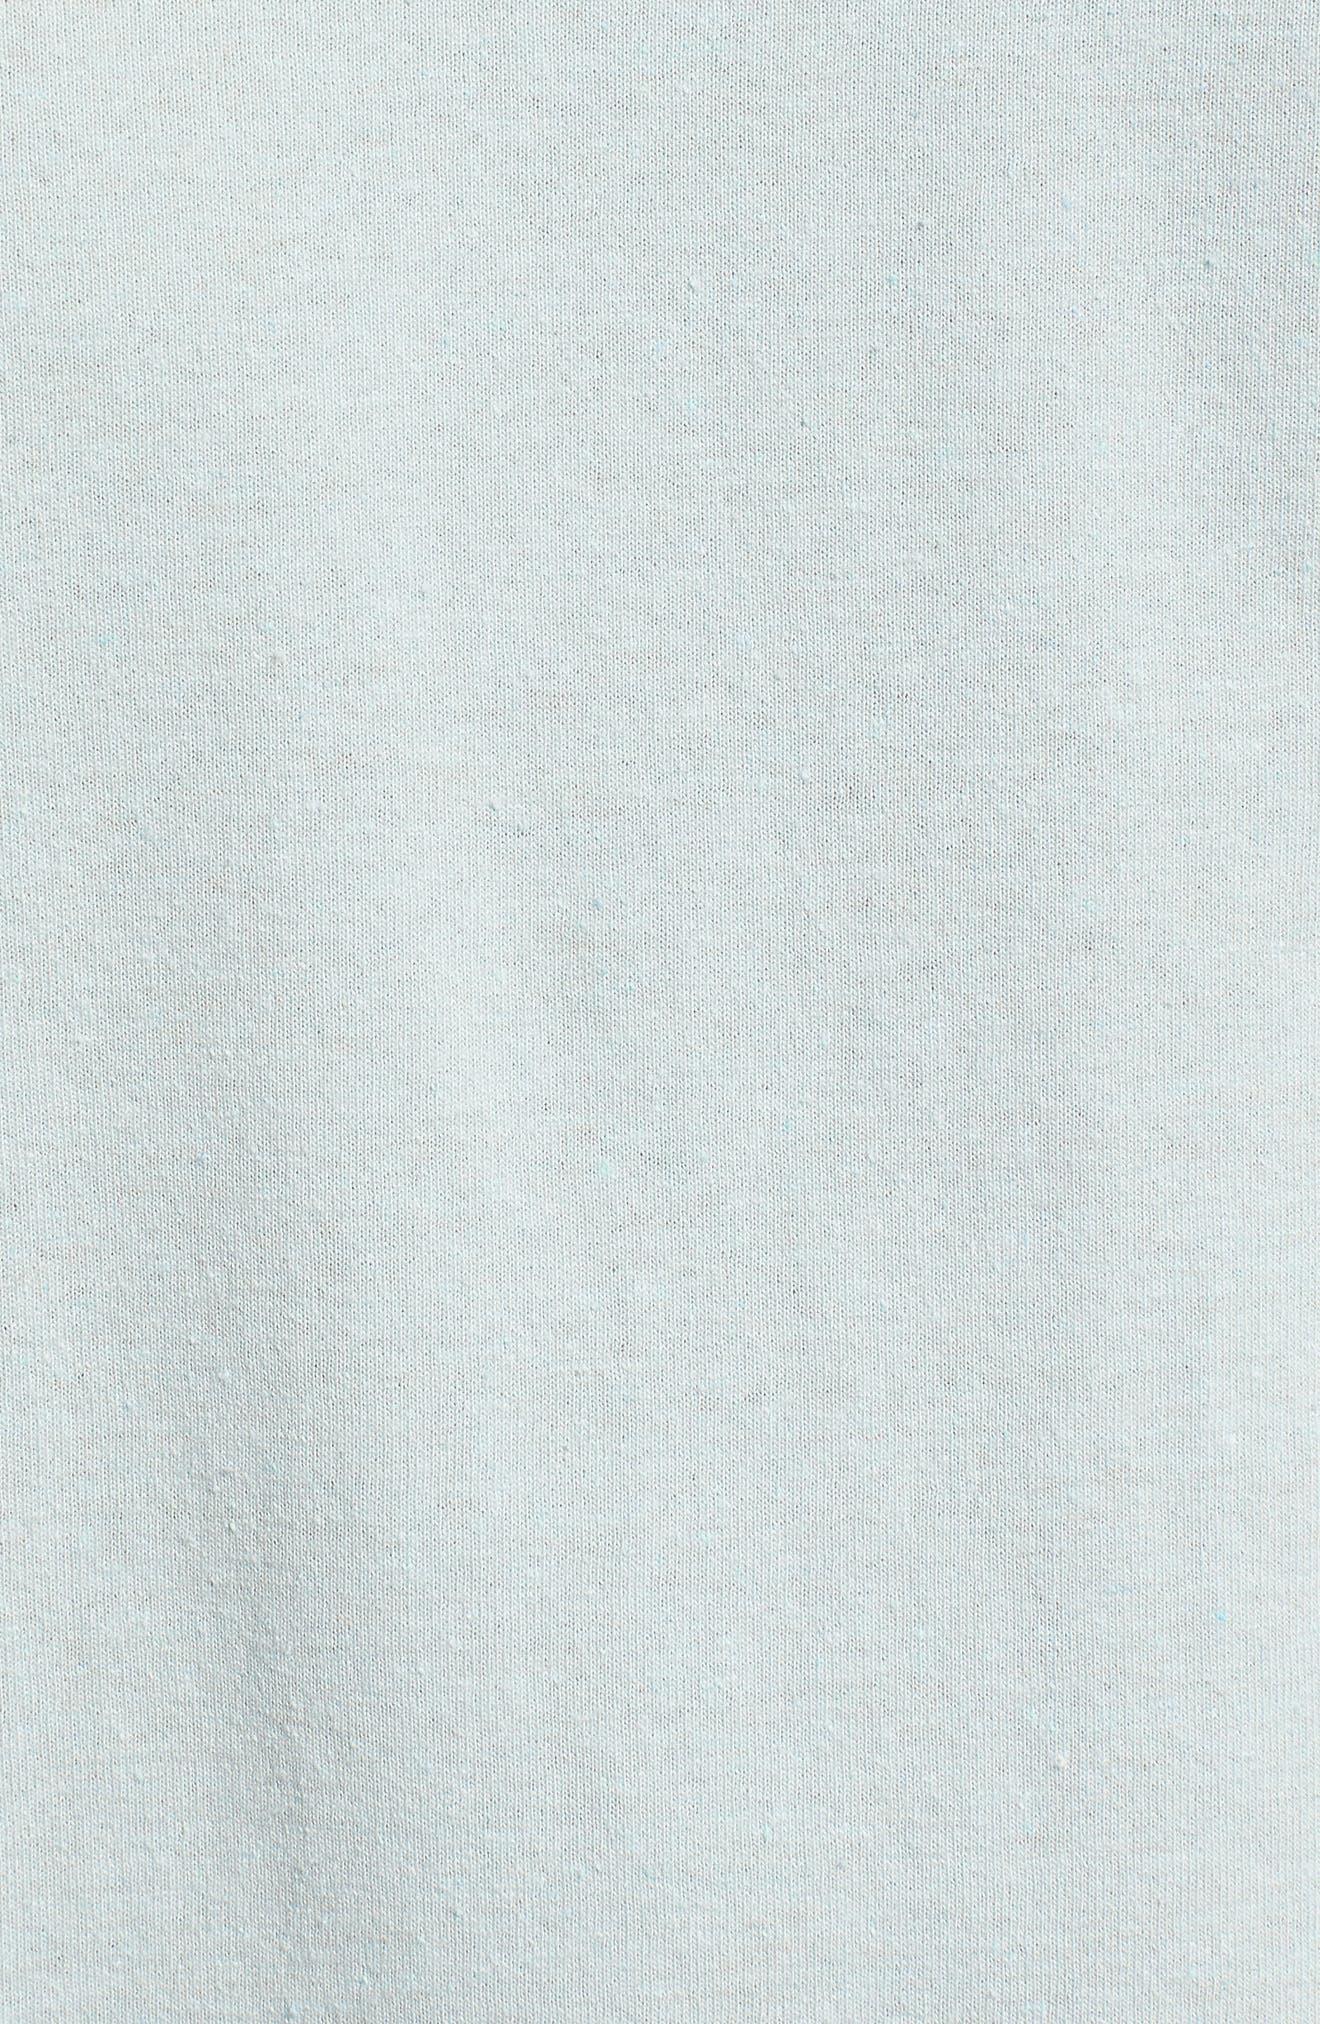 Dawn Patrol Graphic T-Shirt,                             Alternate thumbnail 5, color,                             Light Aqua